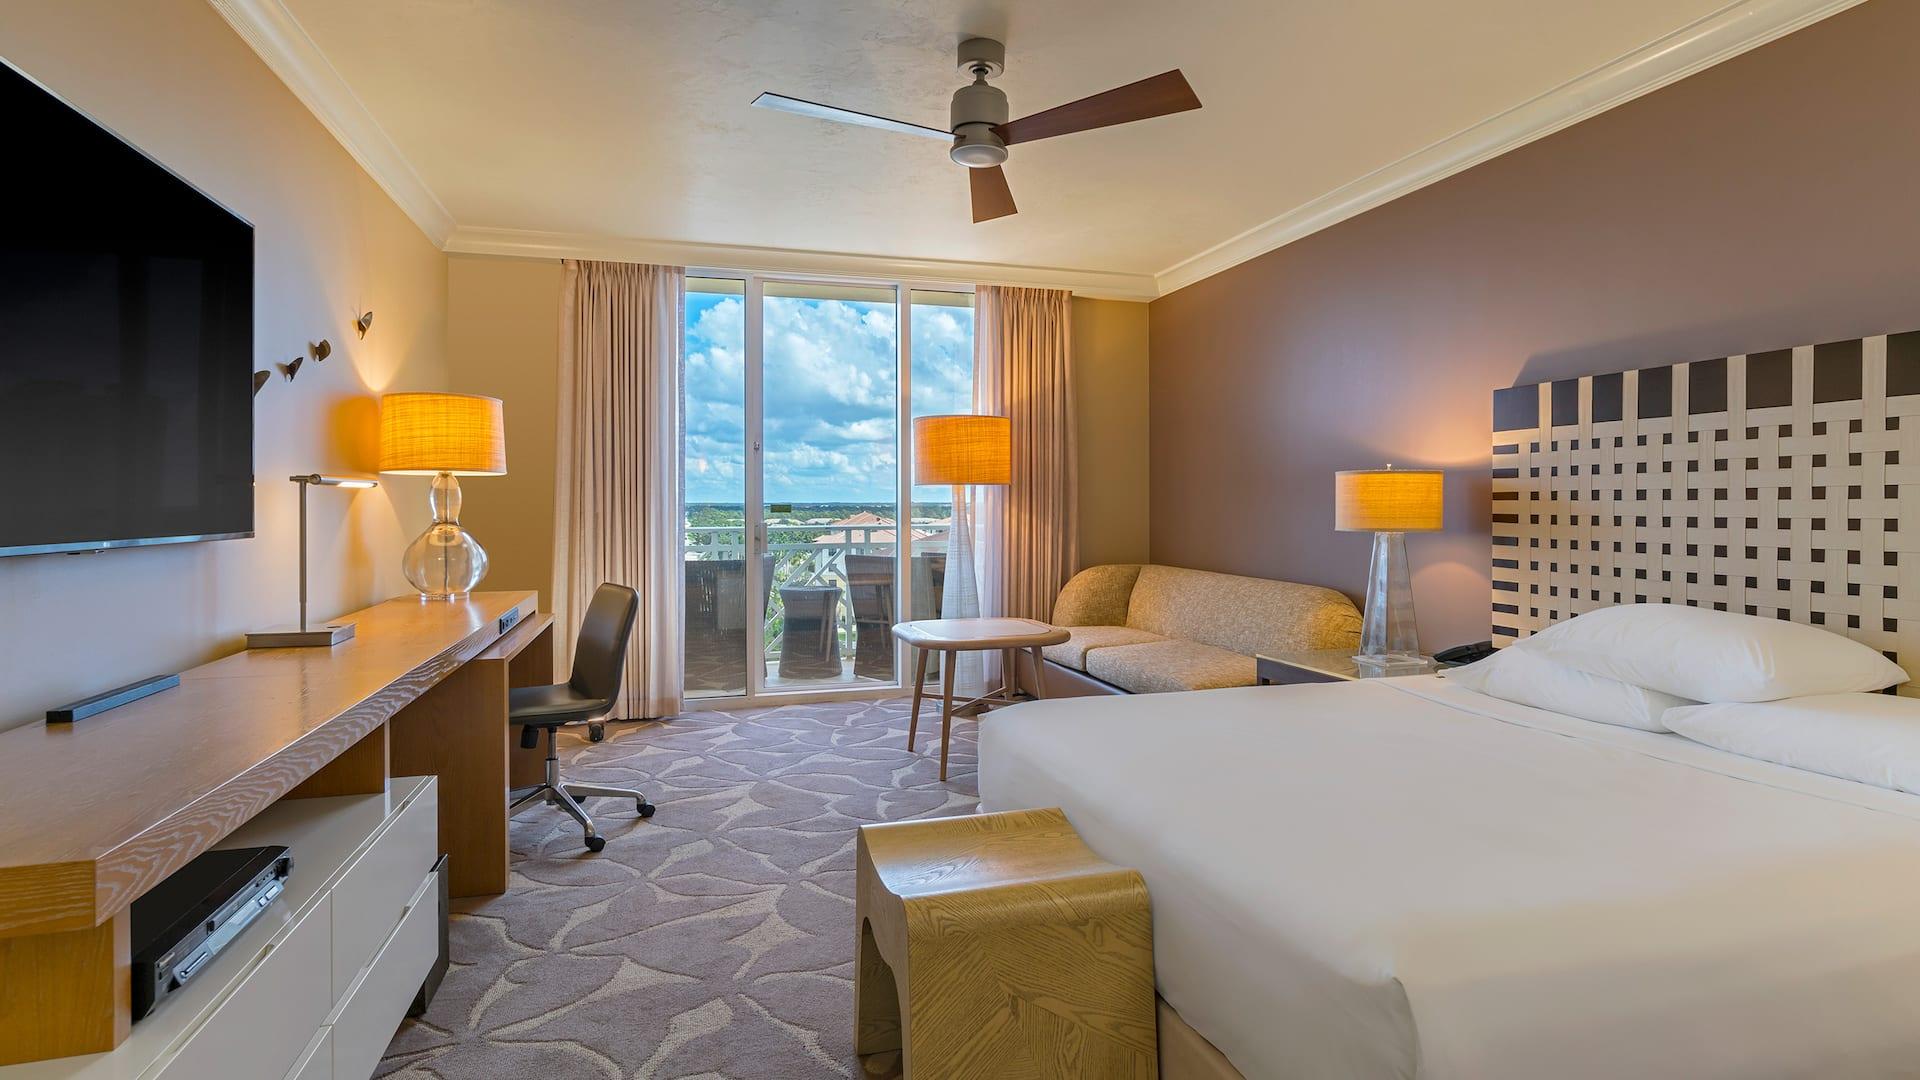 Resort in Bonita Springs with king size bed